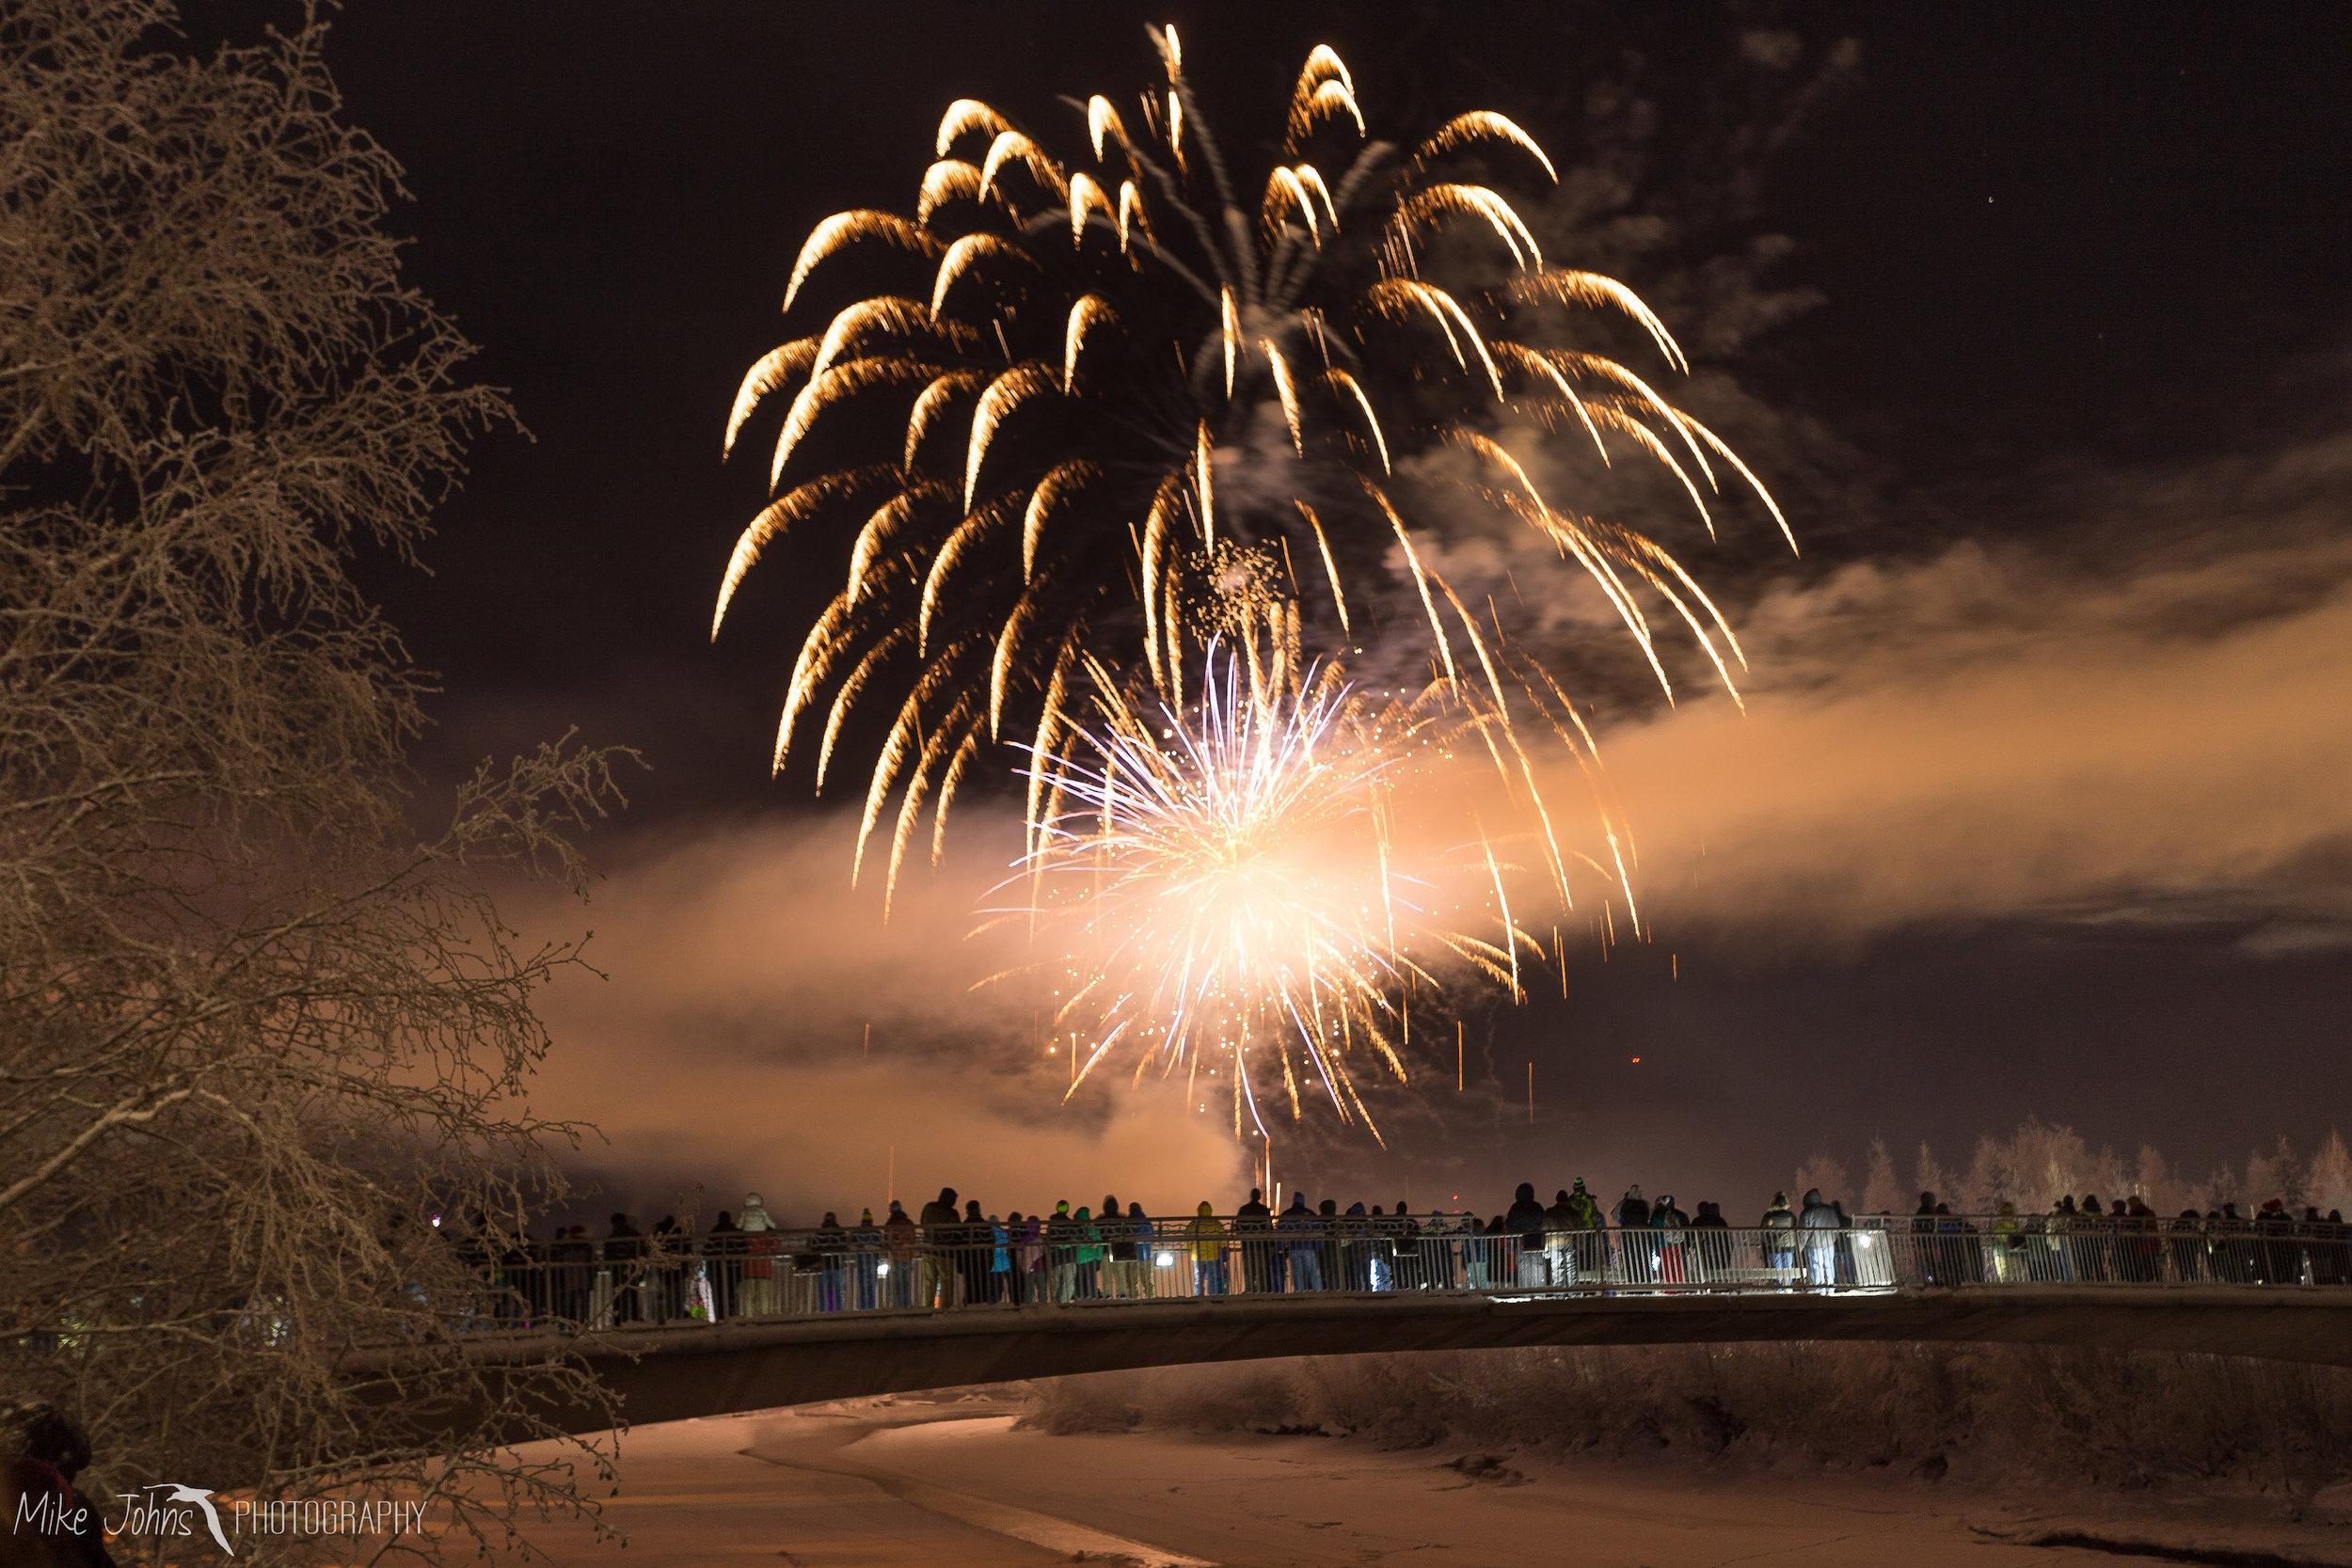 xmas_fireworks_2017-1-7.jpg